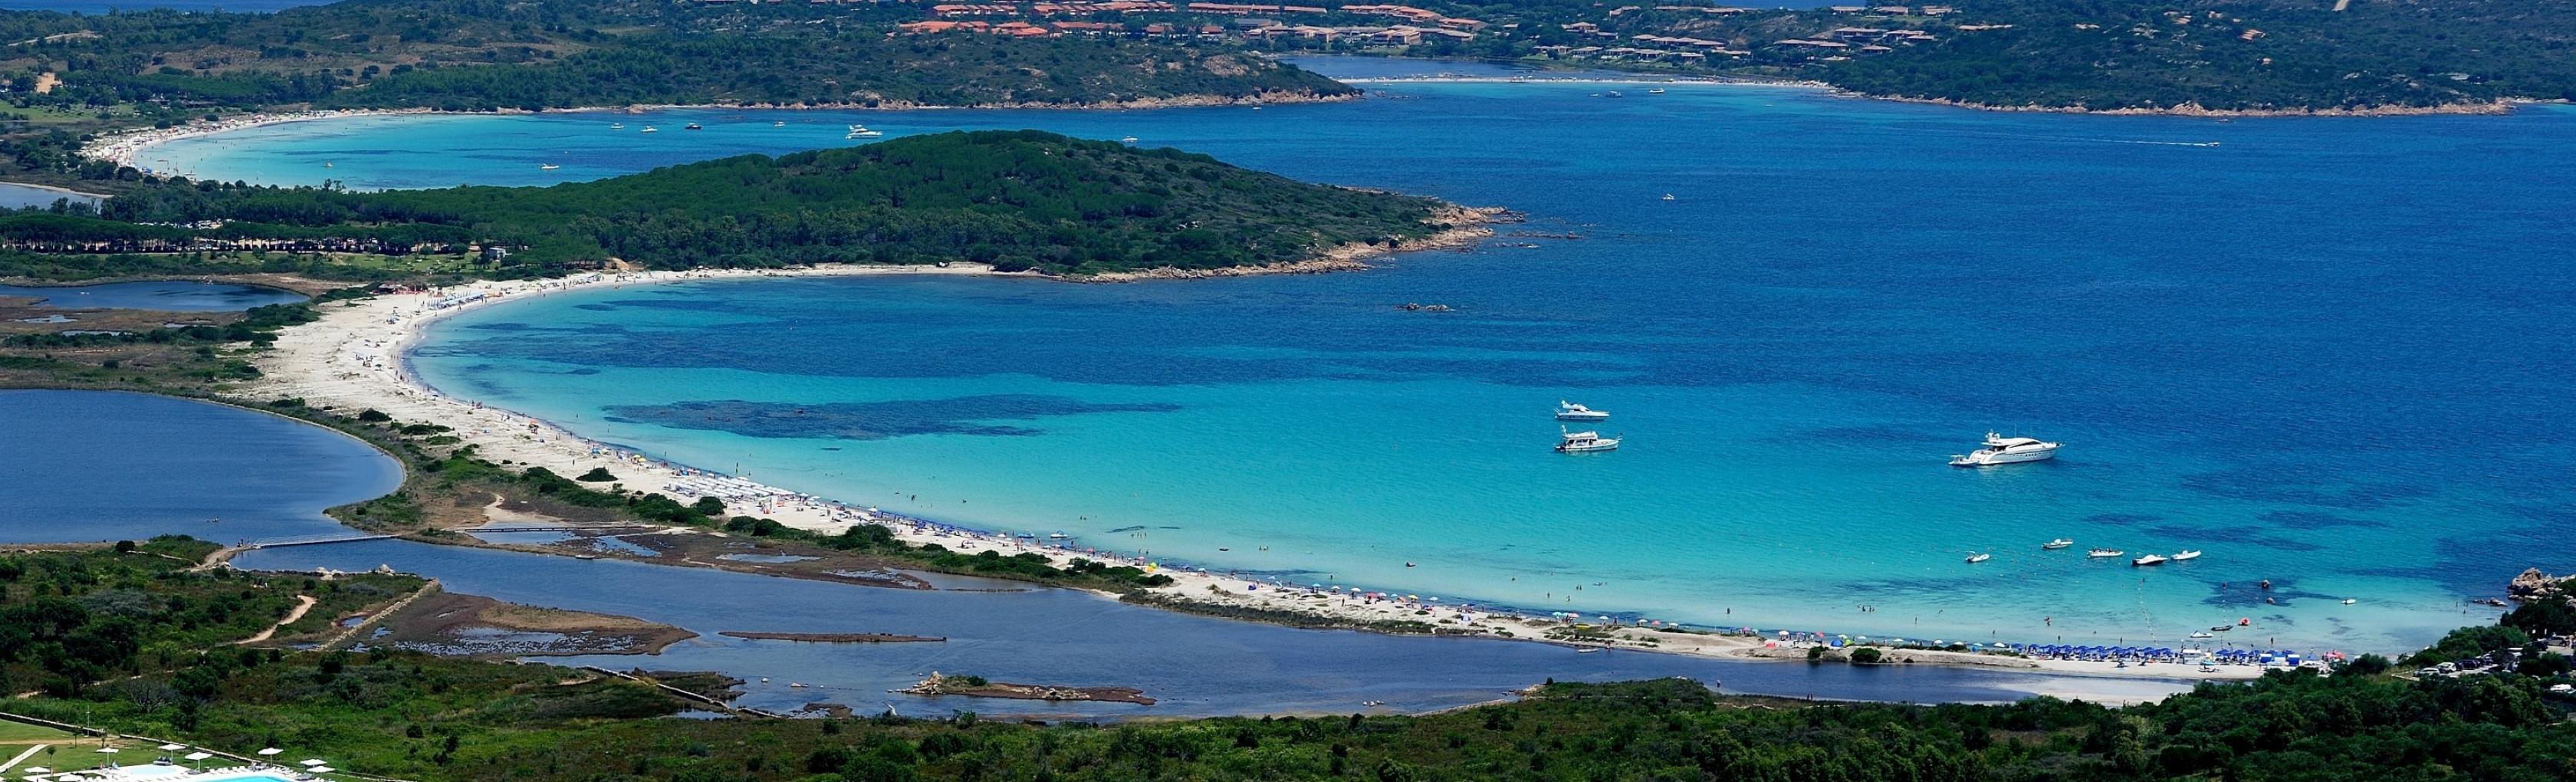 Cala Brandinchi - San Teodoro